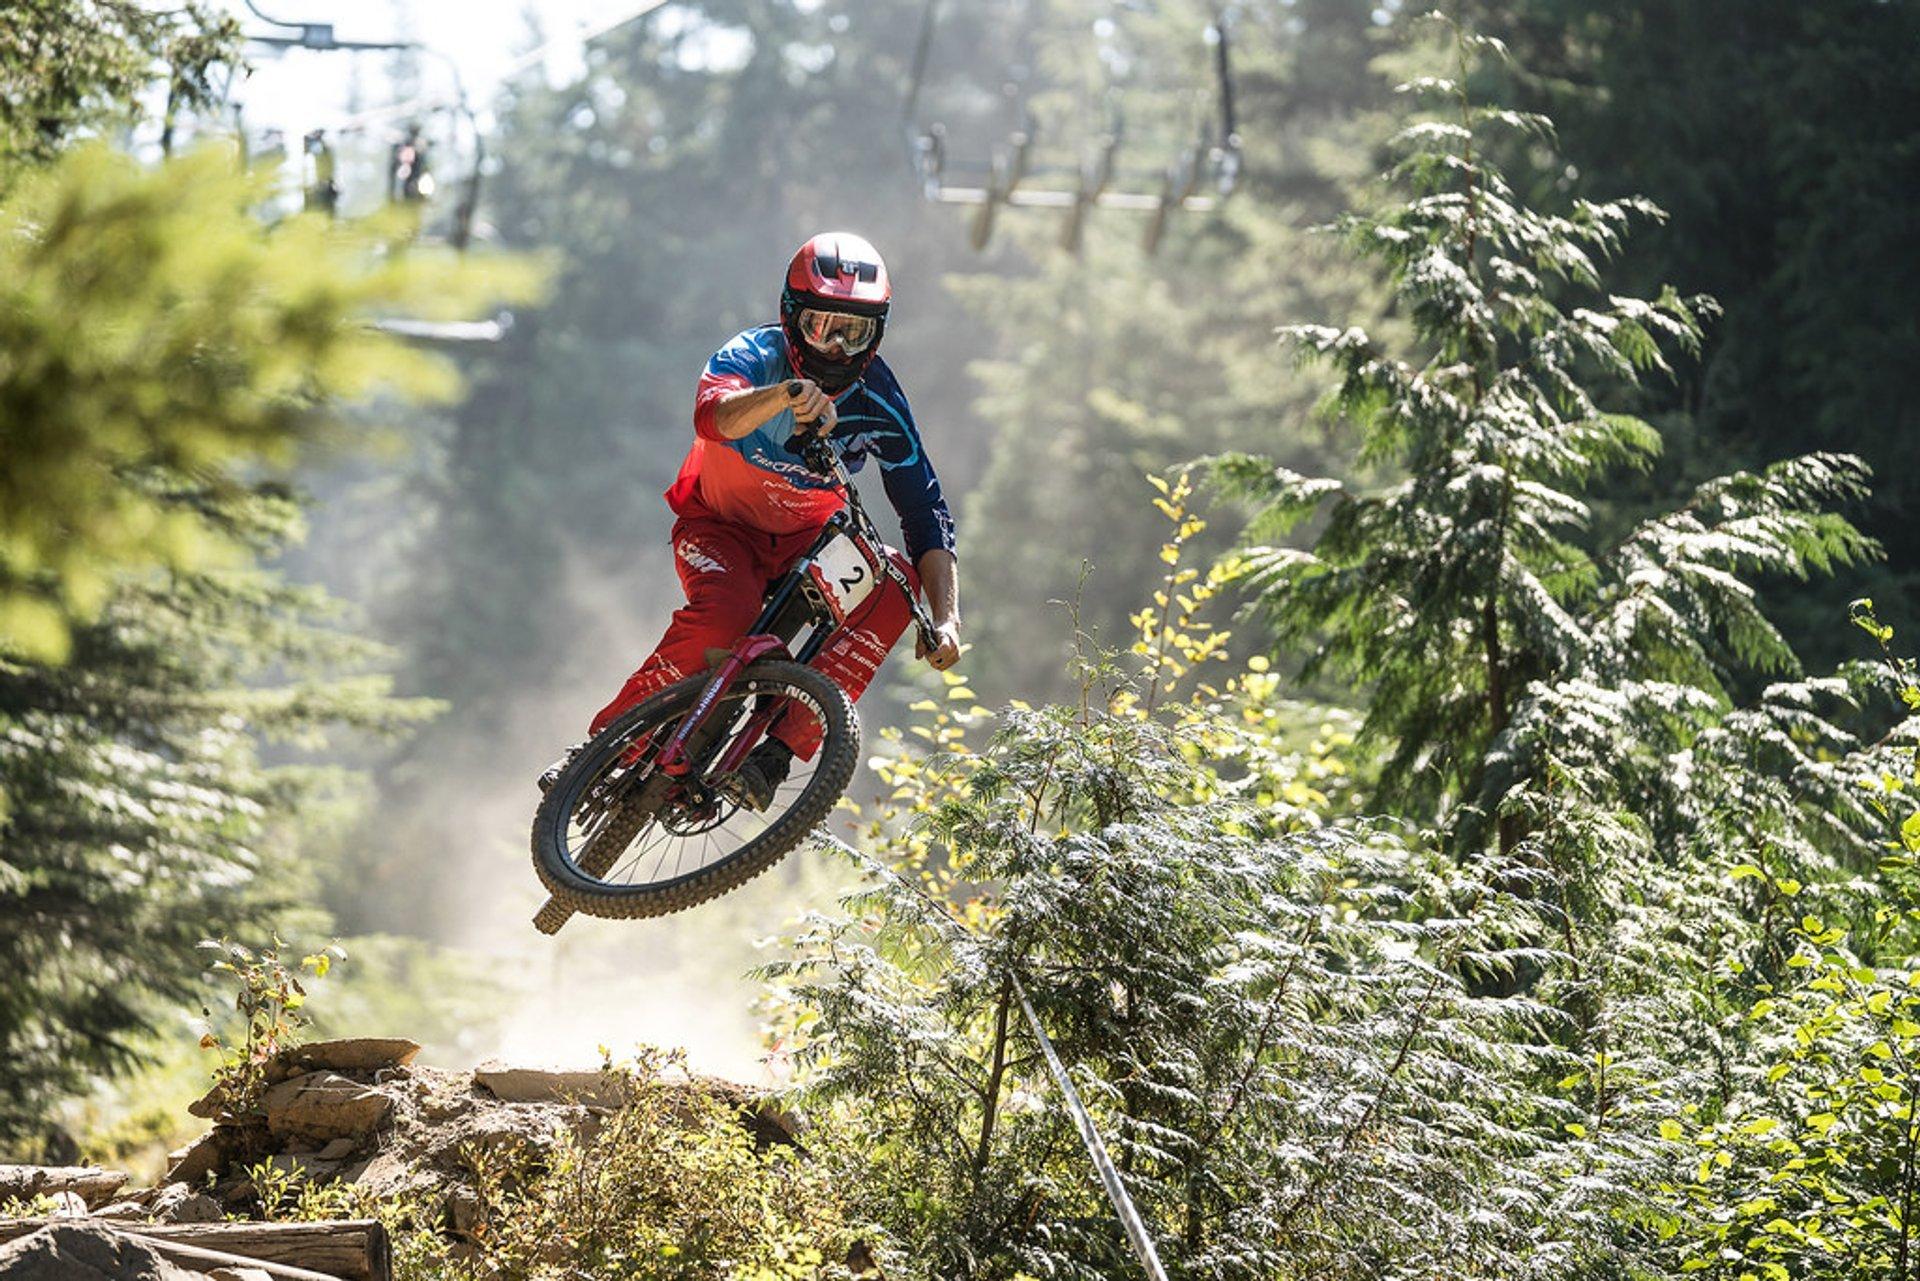 Crankworx Whistler in British Columbia 2020 - Best Time